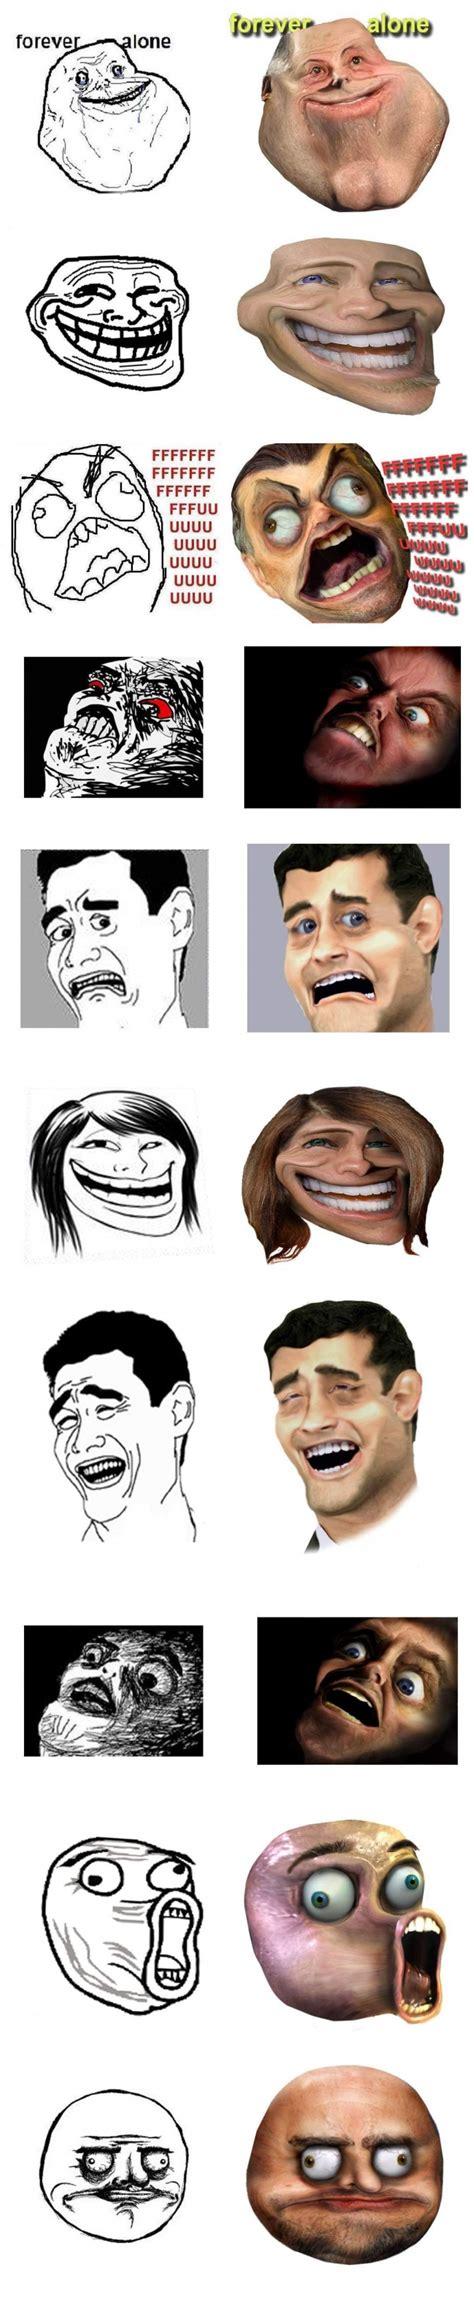 Meme Faces Original Pictures - image gallery original meme faces why